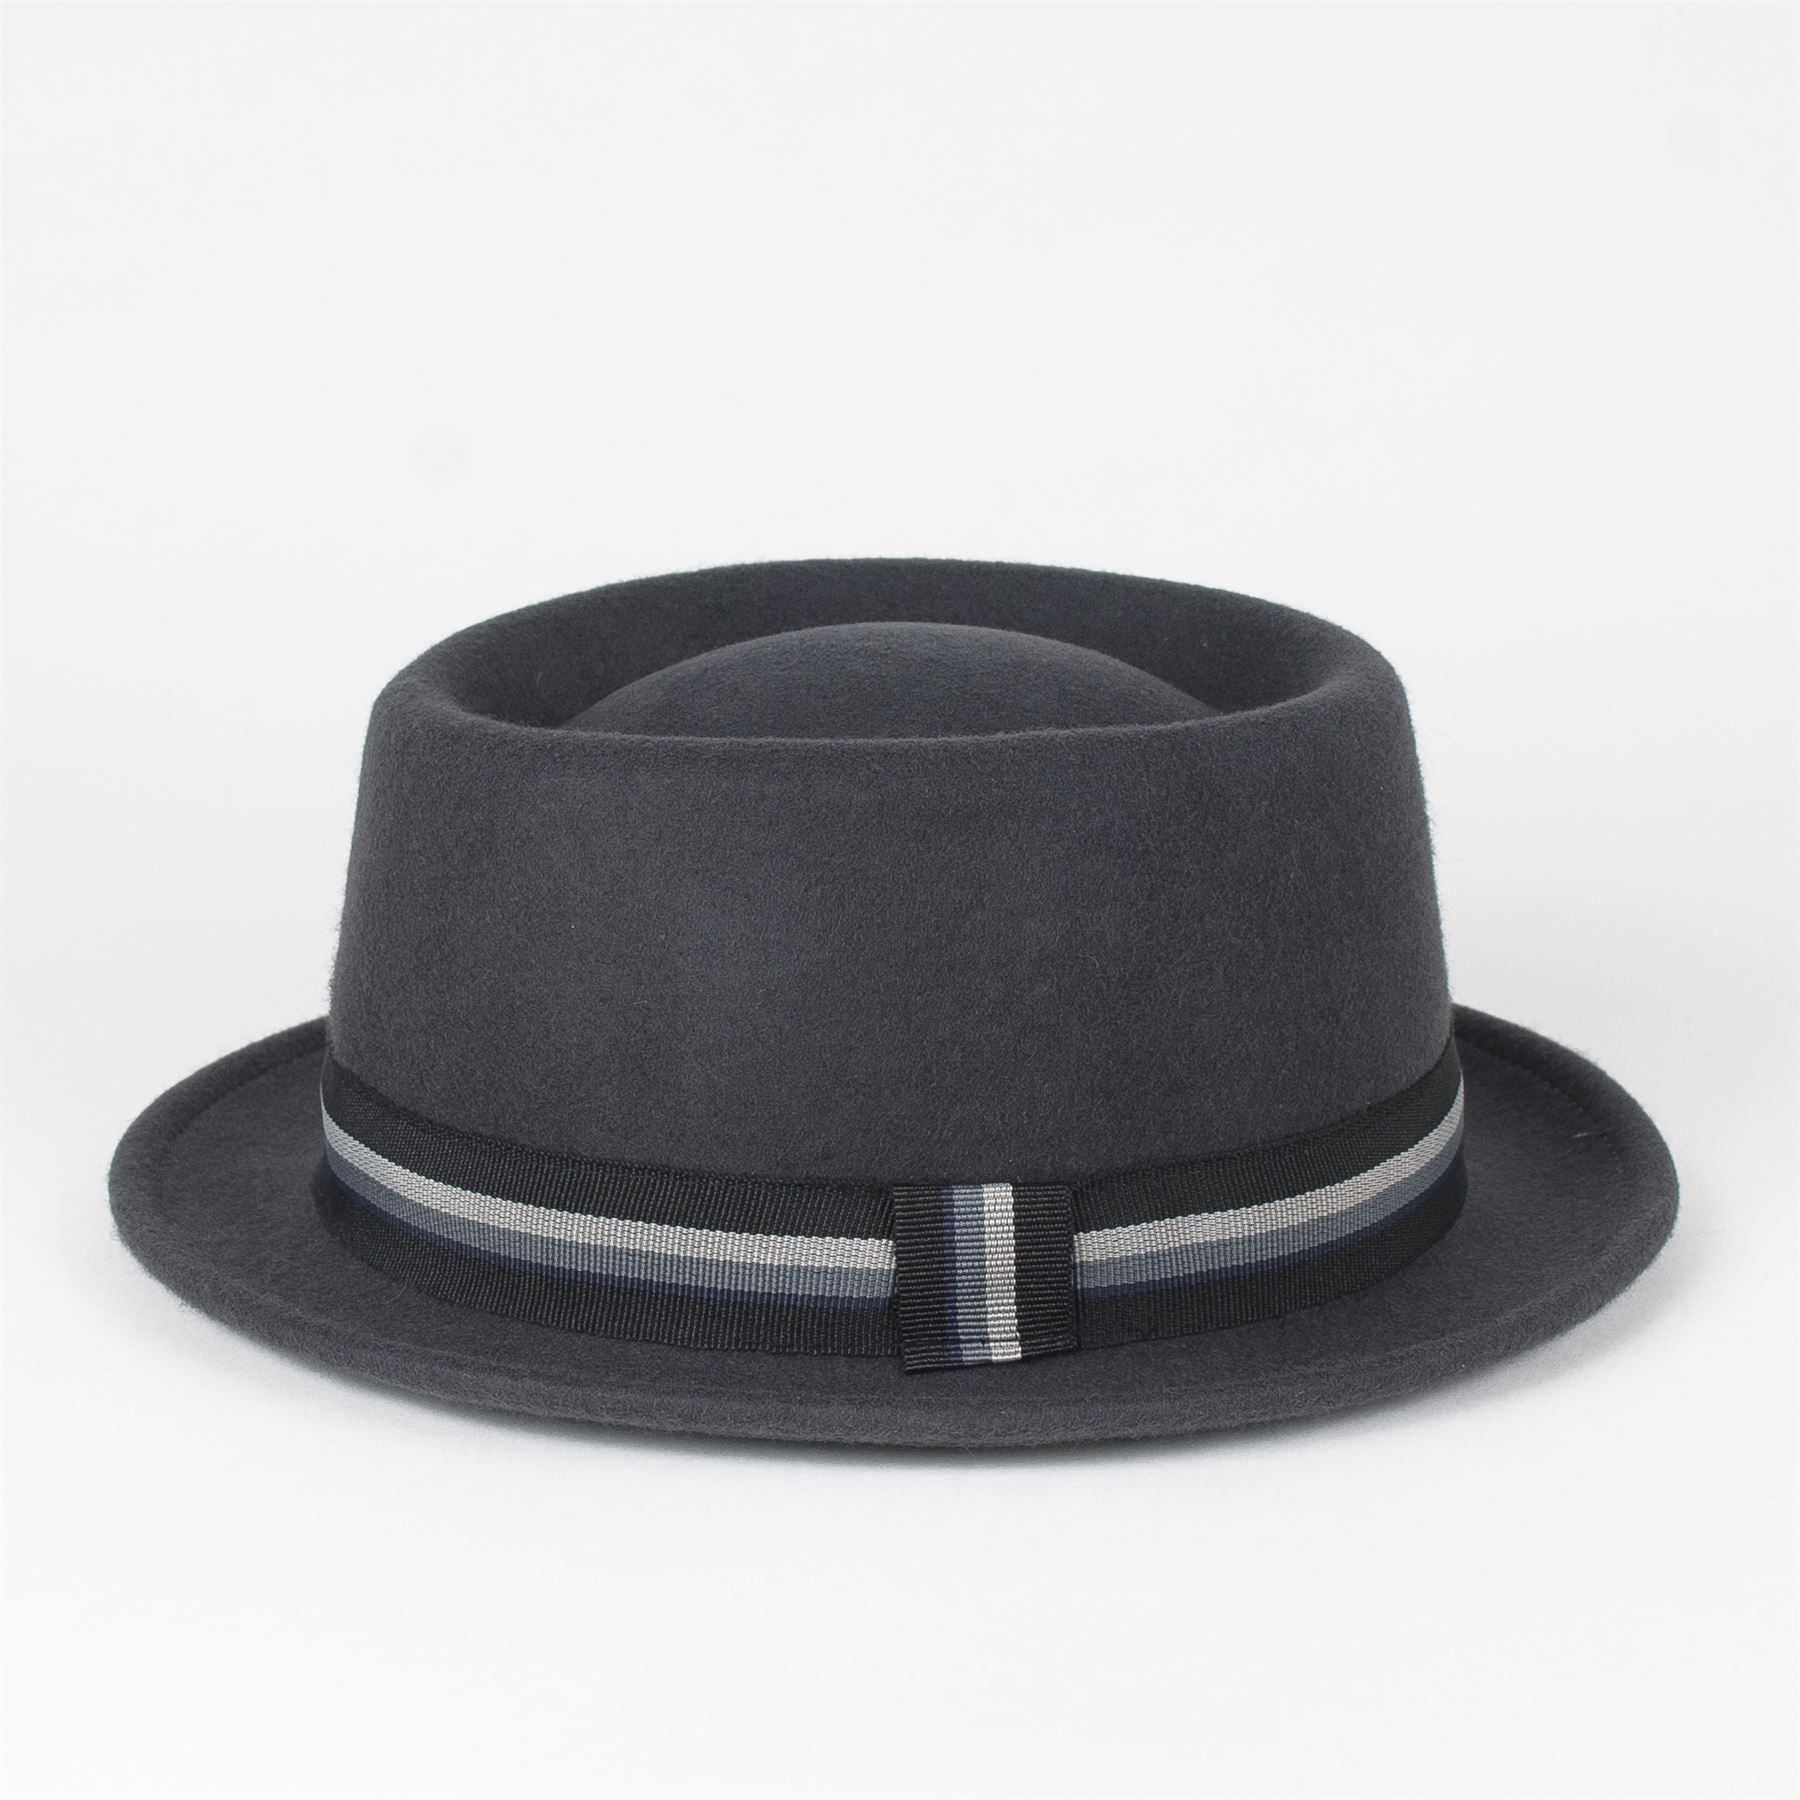 77cc1502f30 Stylish 100% Wool Pork Pie Hat Waterproof   Crushable